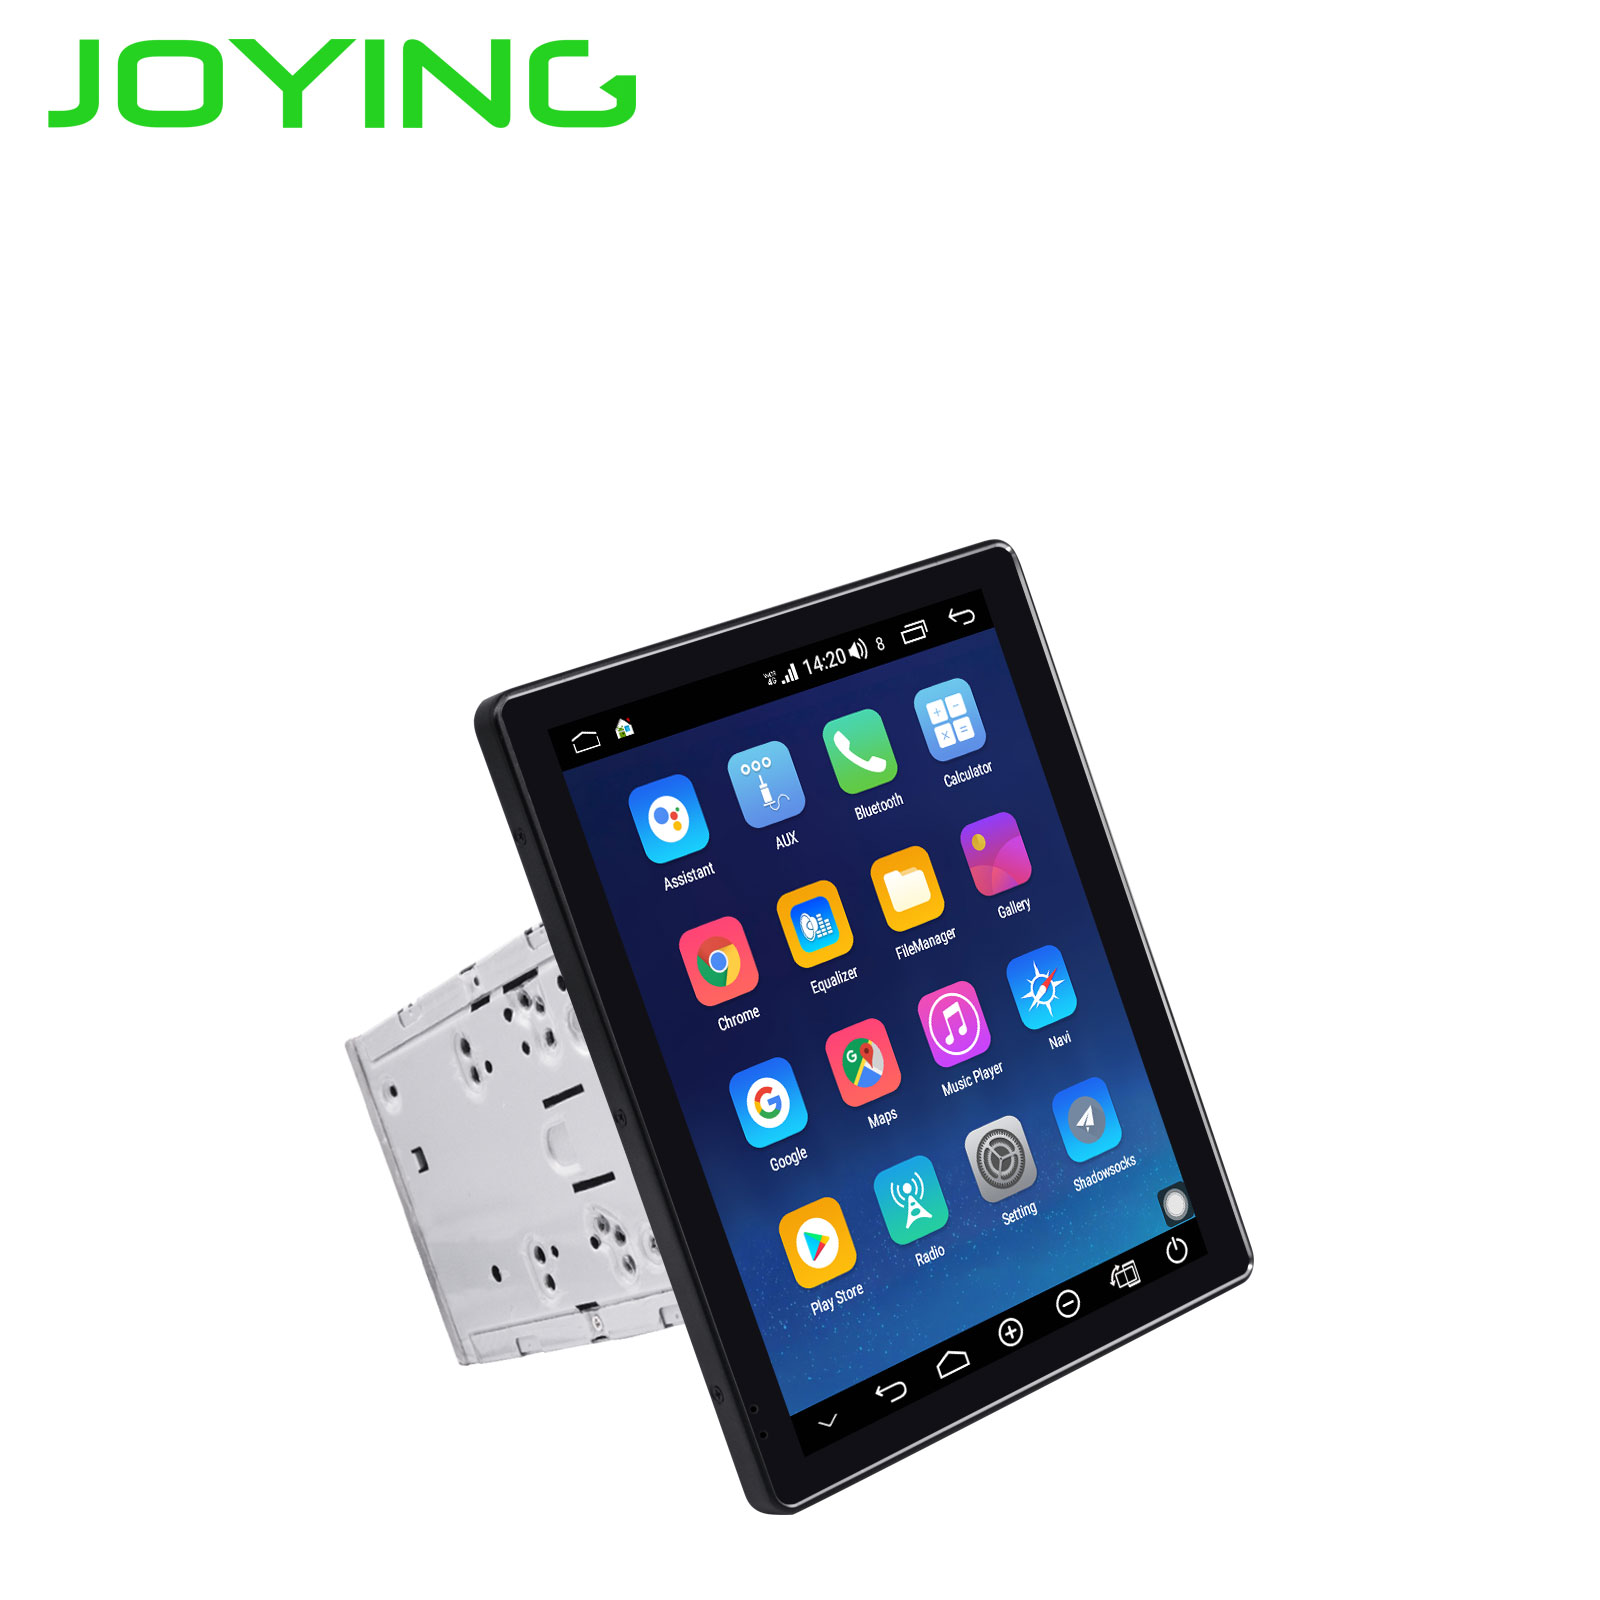 JOYING 2 din car radio Android 8.1 Octa Core 9.7 inch IPS screen 4GB+64GB support 4G autoradio split screen fast boot GPS DSP